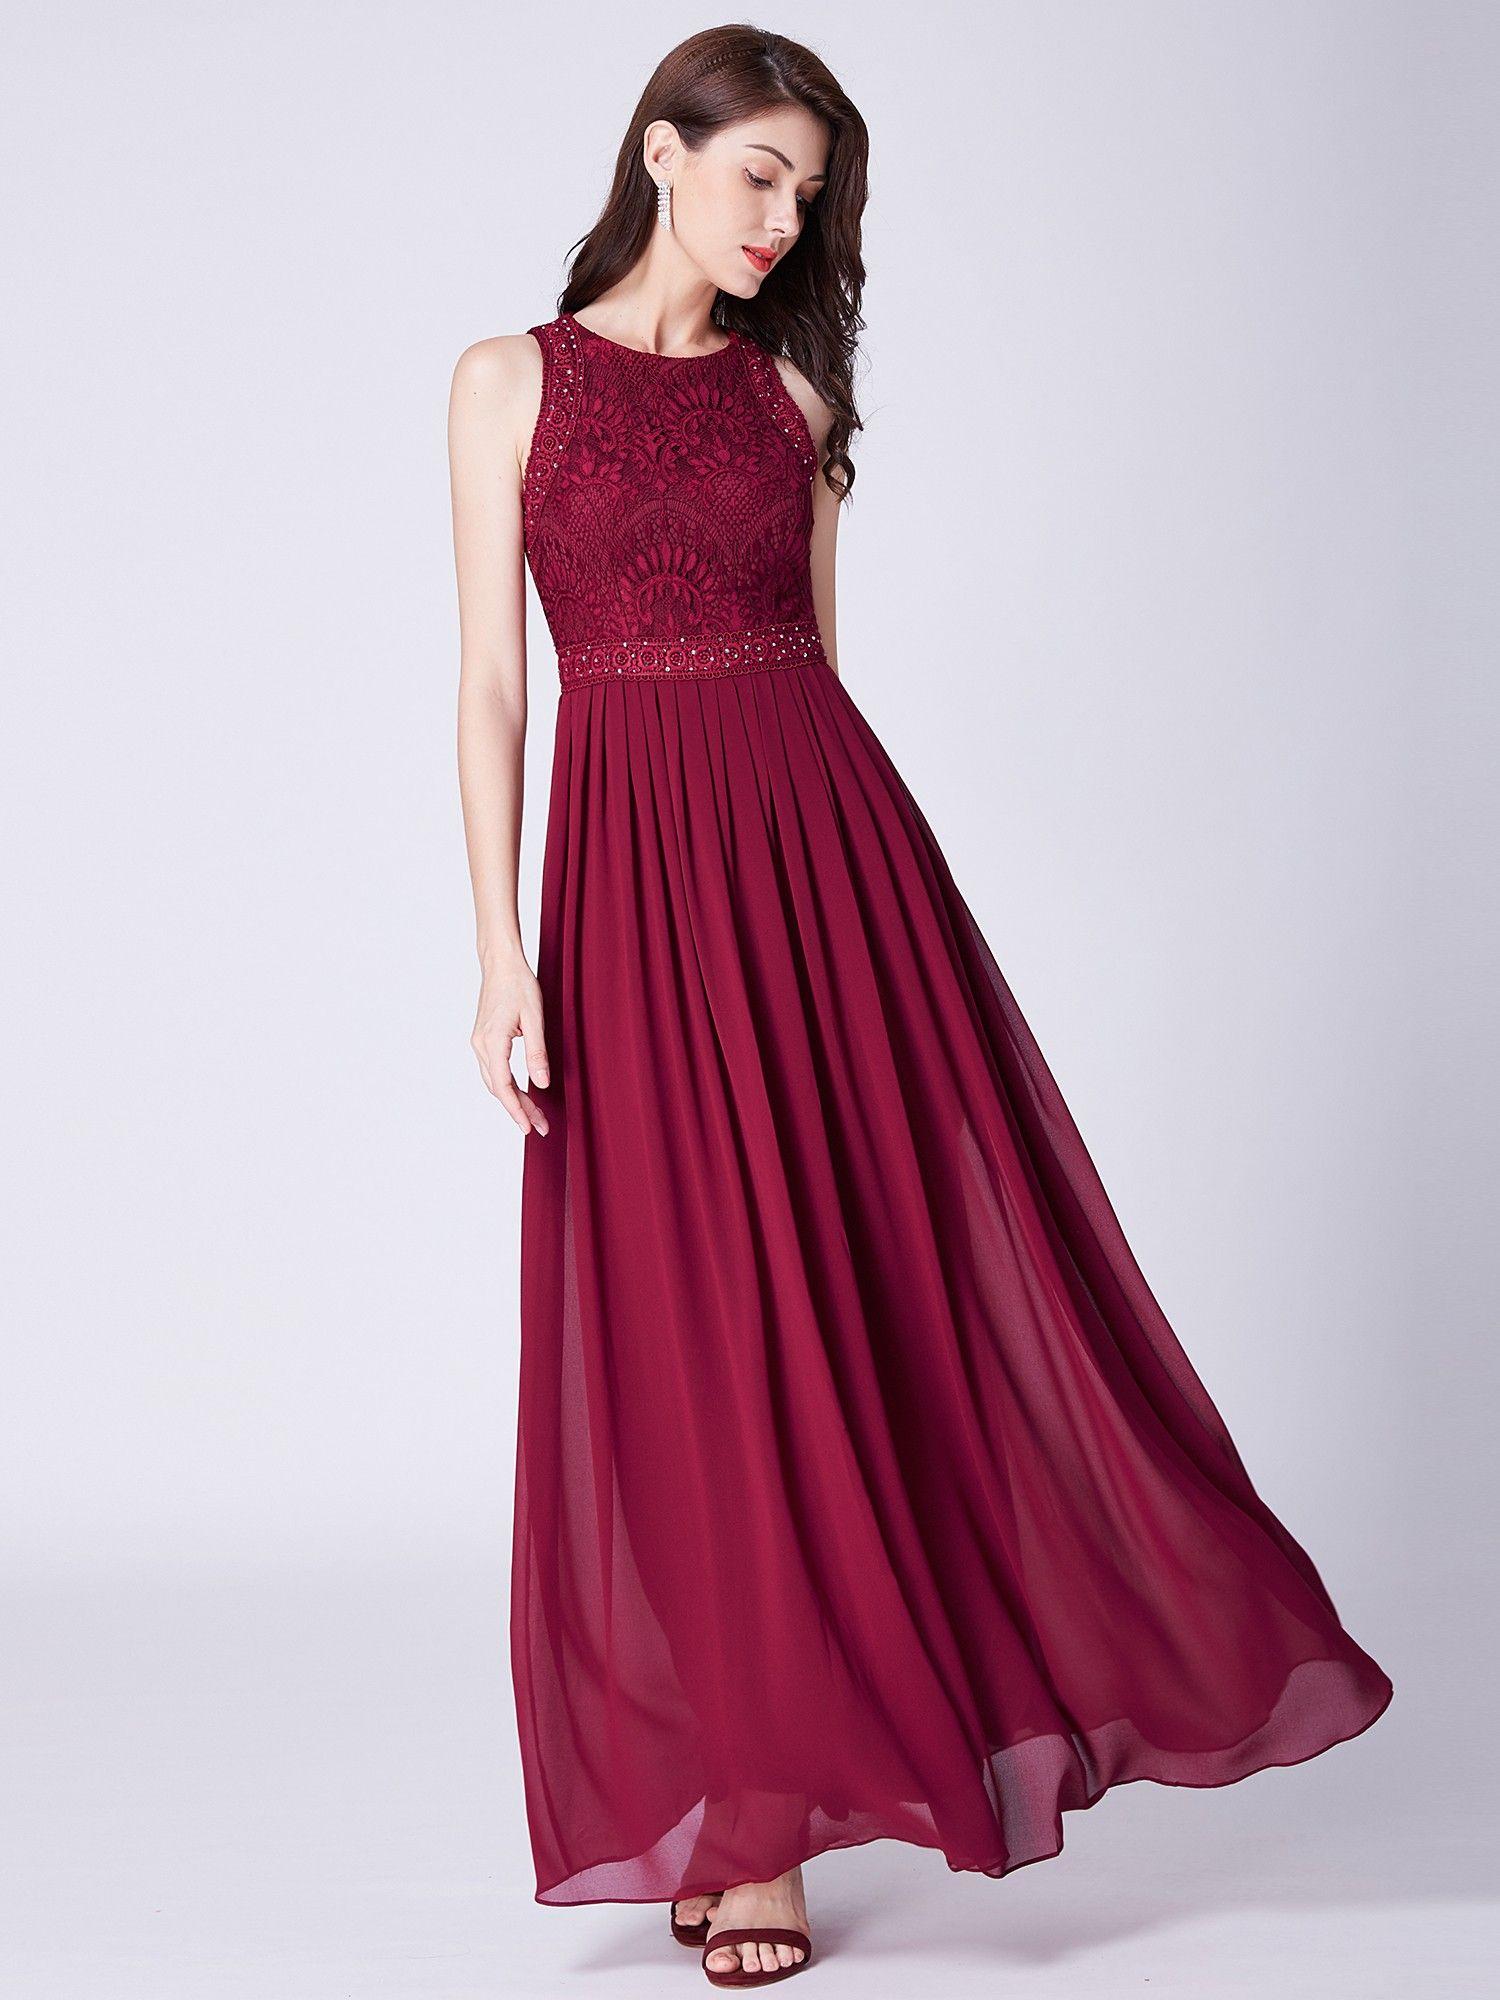 9cc7e2fc9eede Sleeveless High Collar Long A Line Evening Dress | Ever-Pretty #bridesmaid  #bridesmaids